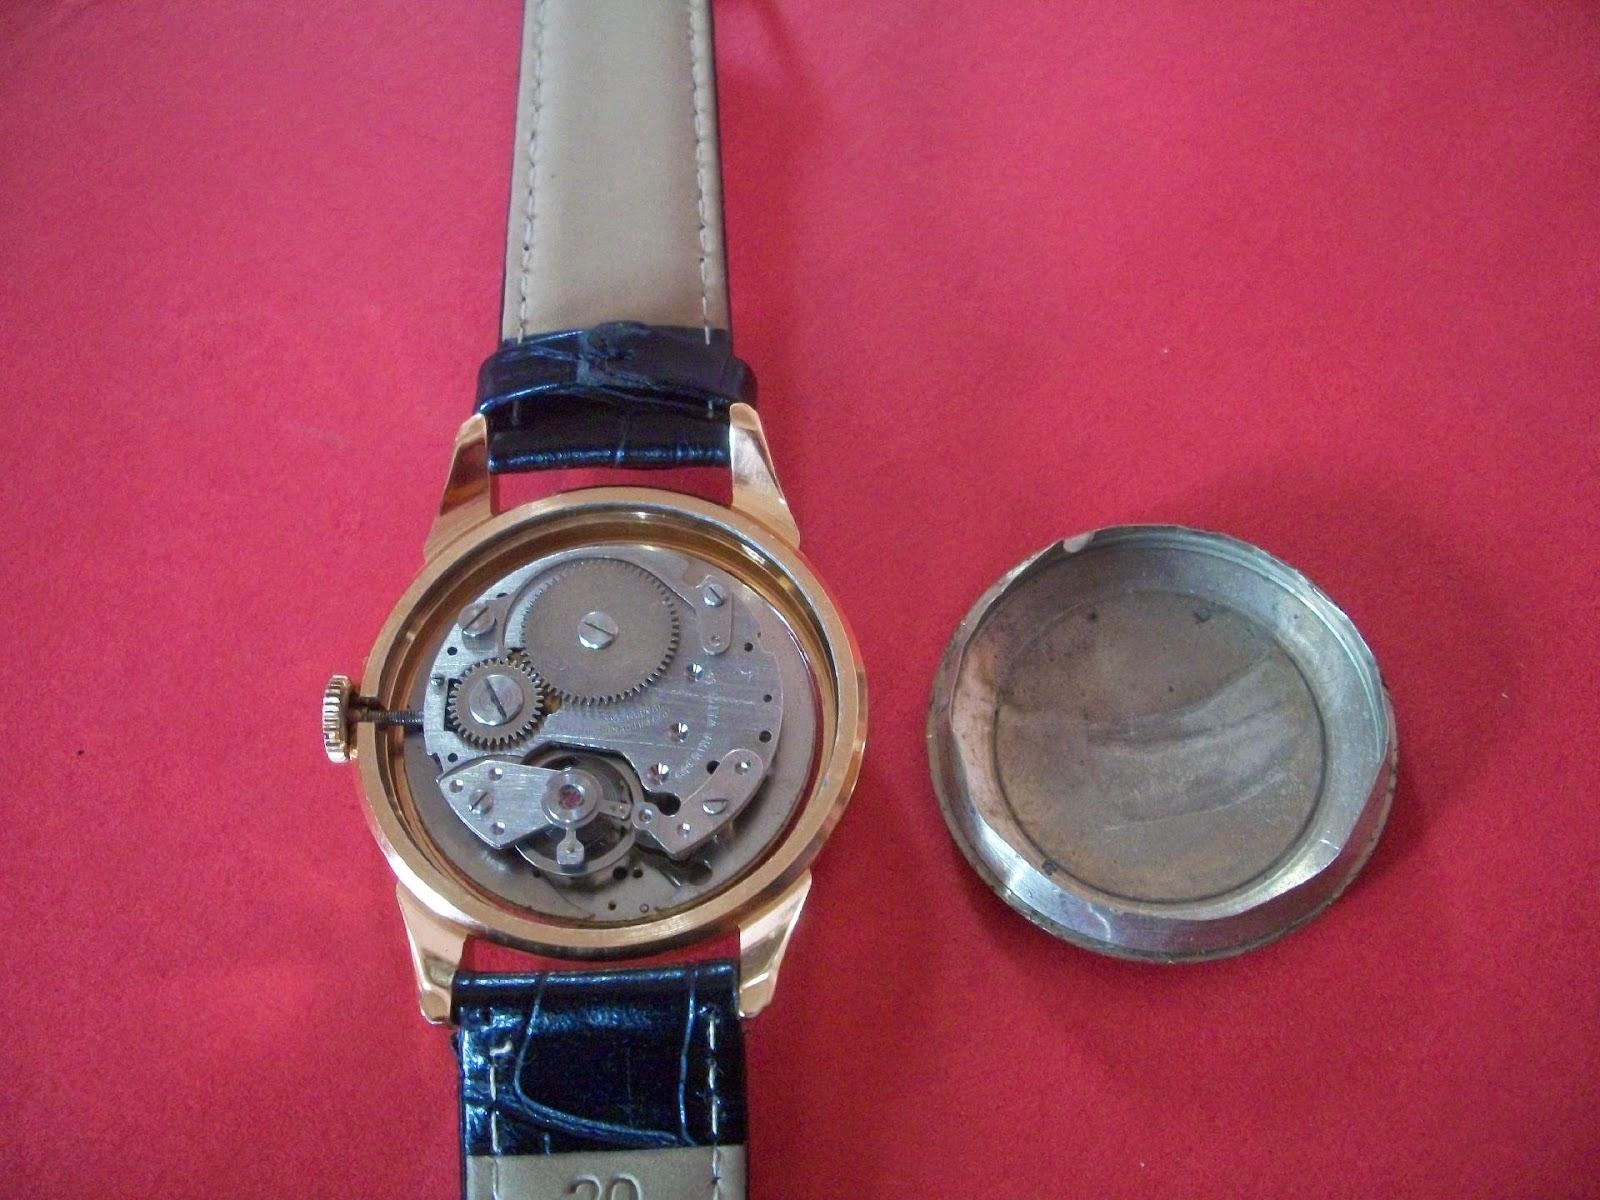 SPERINA Manual Winding Watch Vintage 1 jewel movement